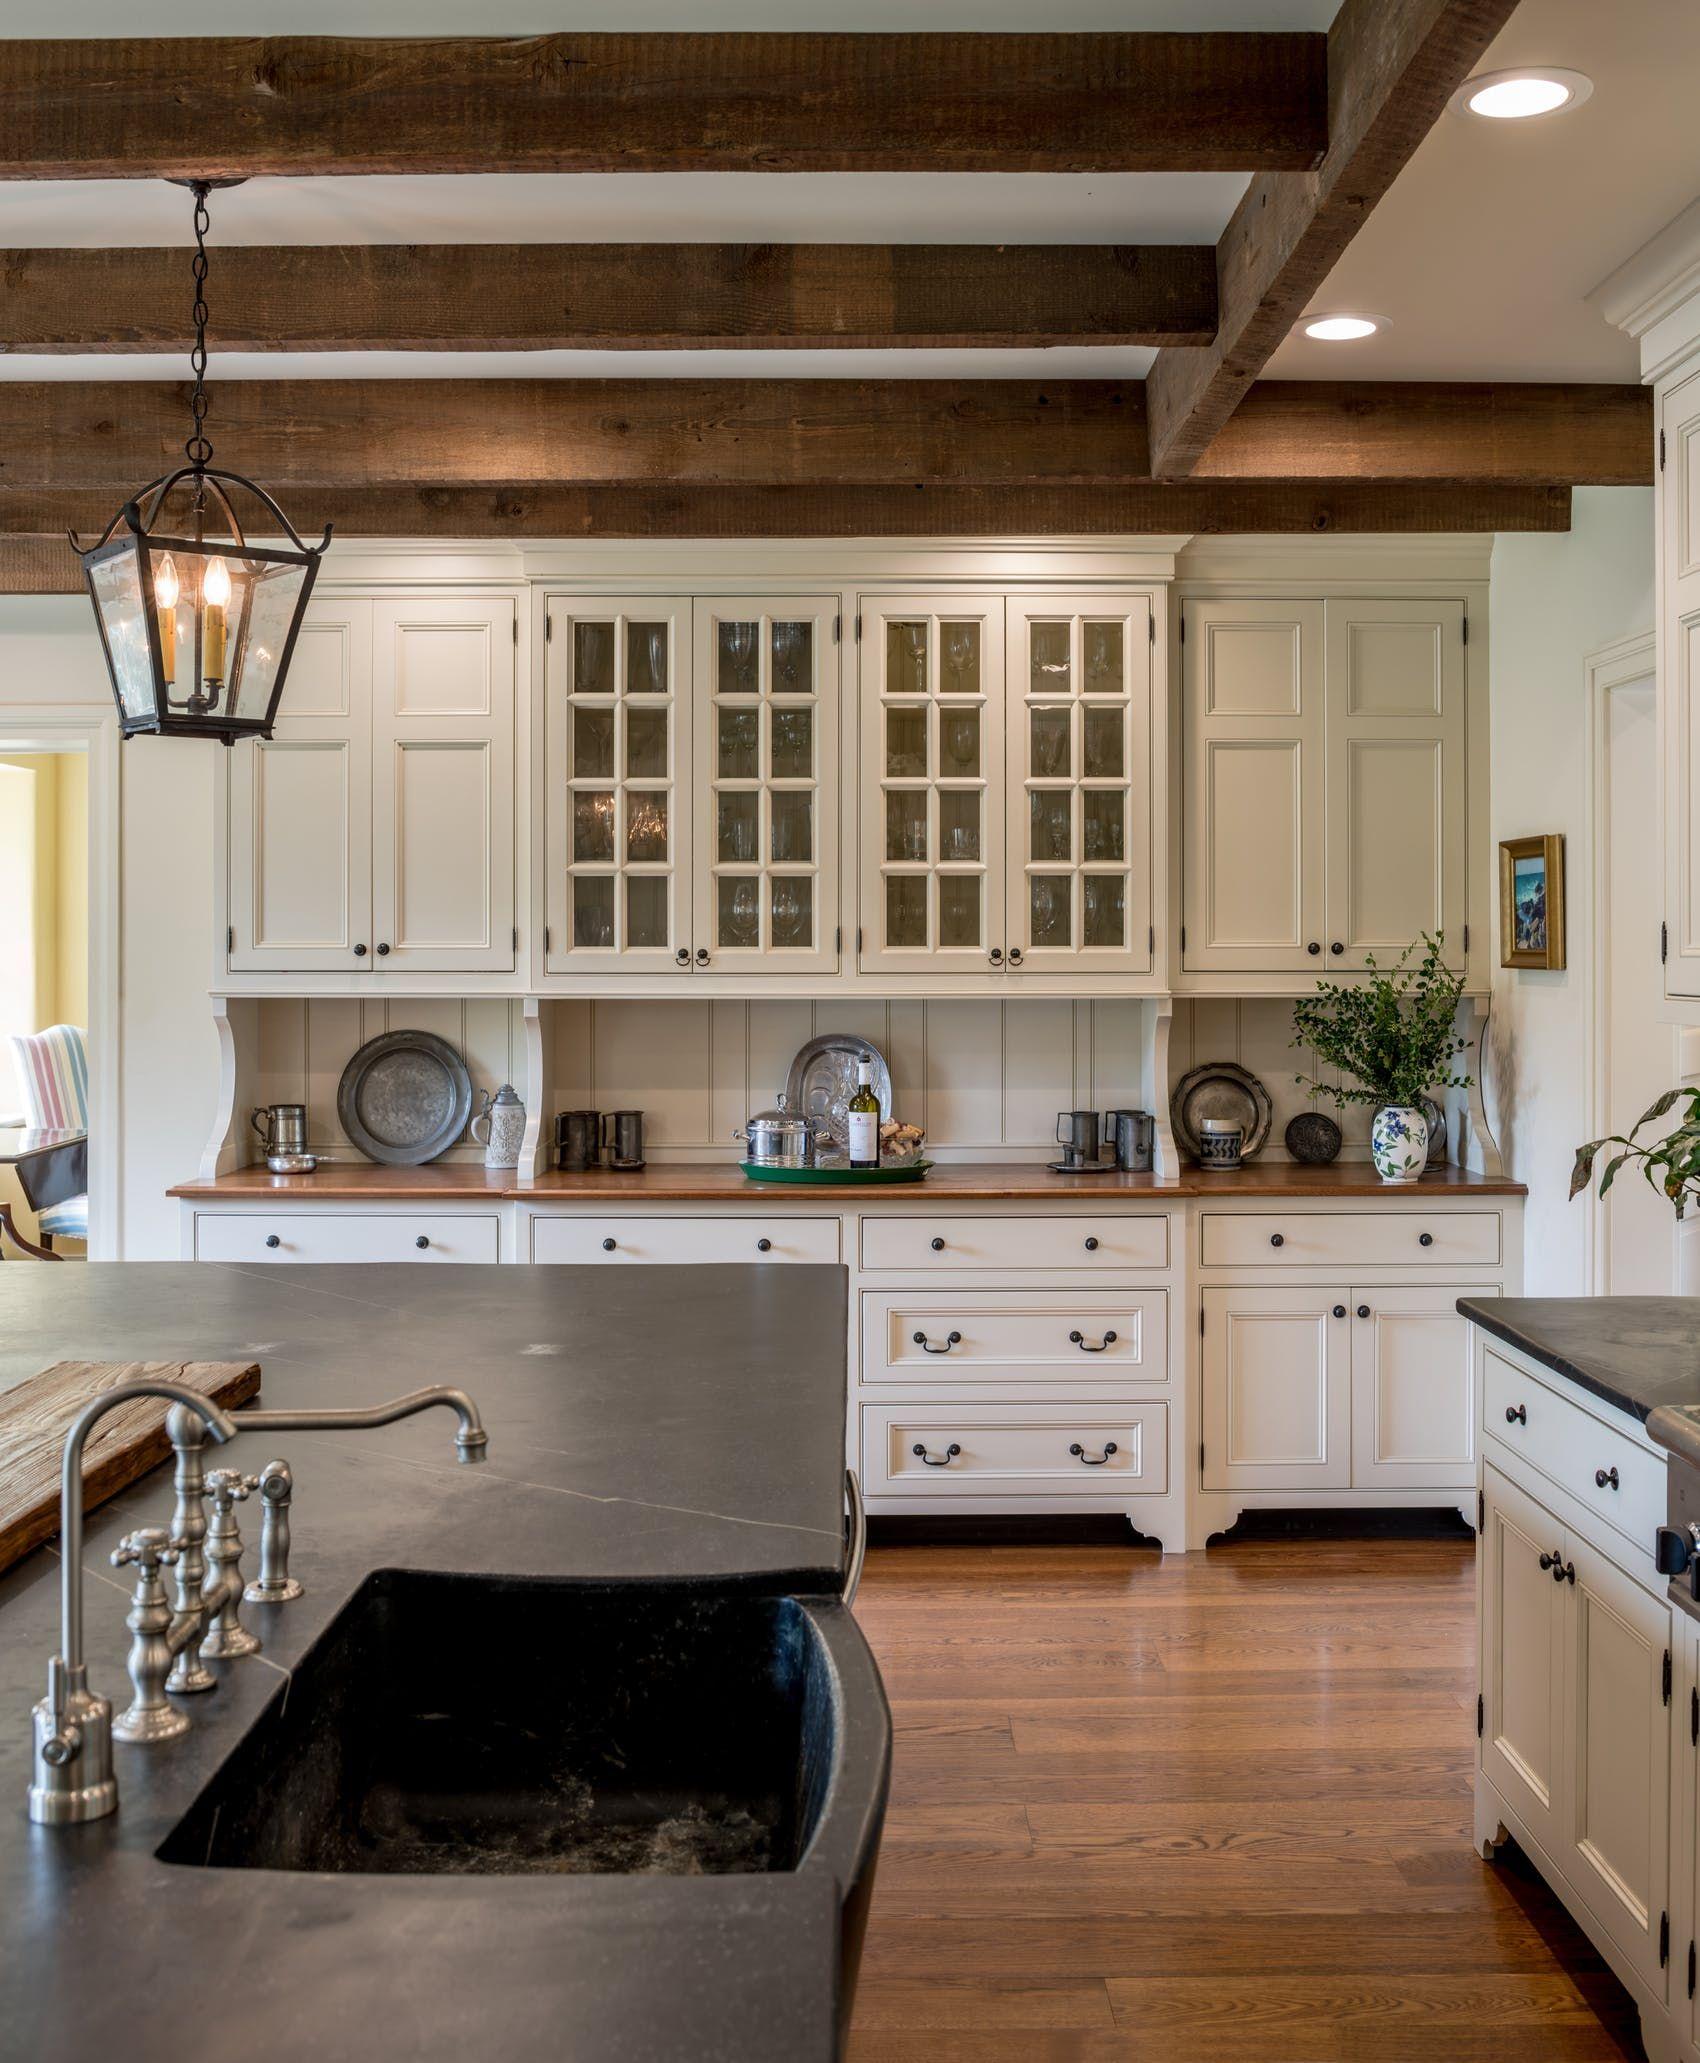 Period Kitchens Designs Renovation: 105879.period.architecture.portfolio.interiors.kitchen